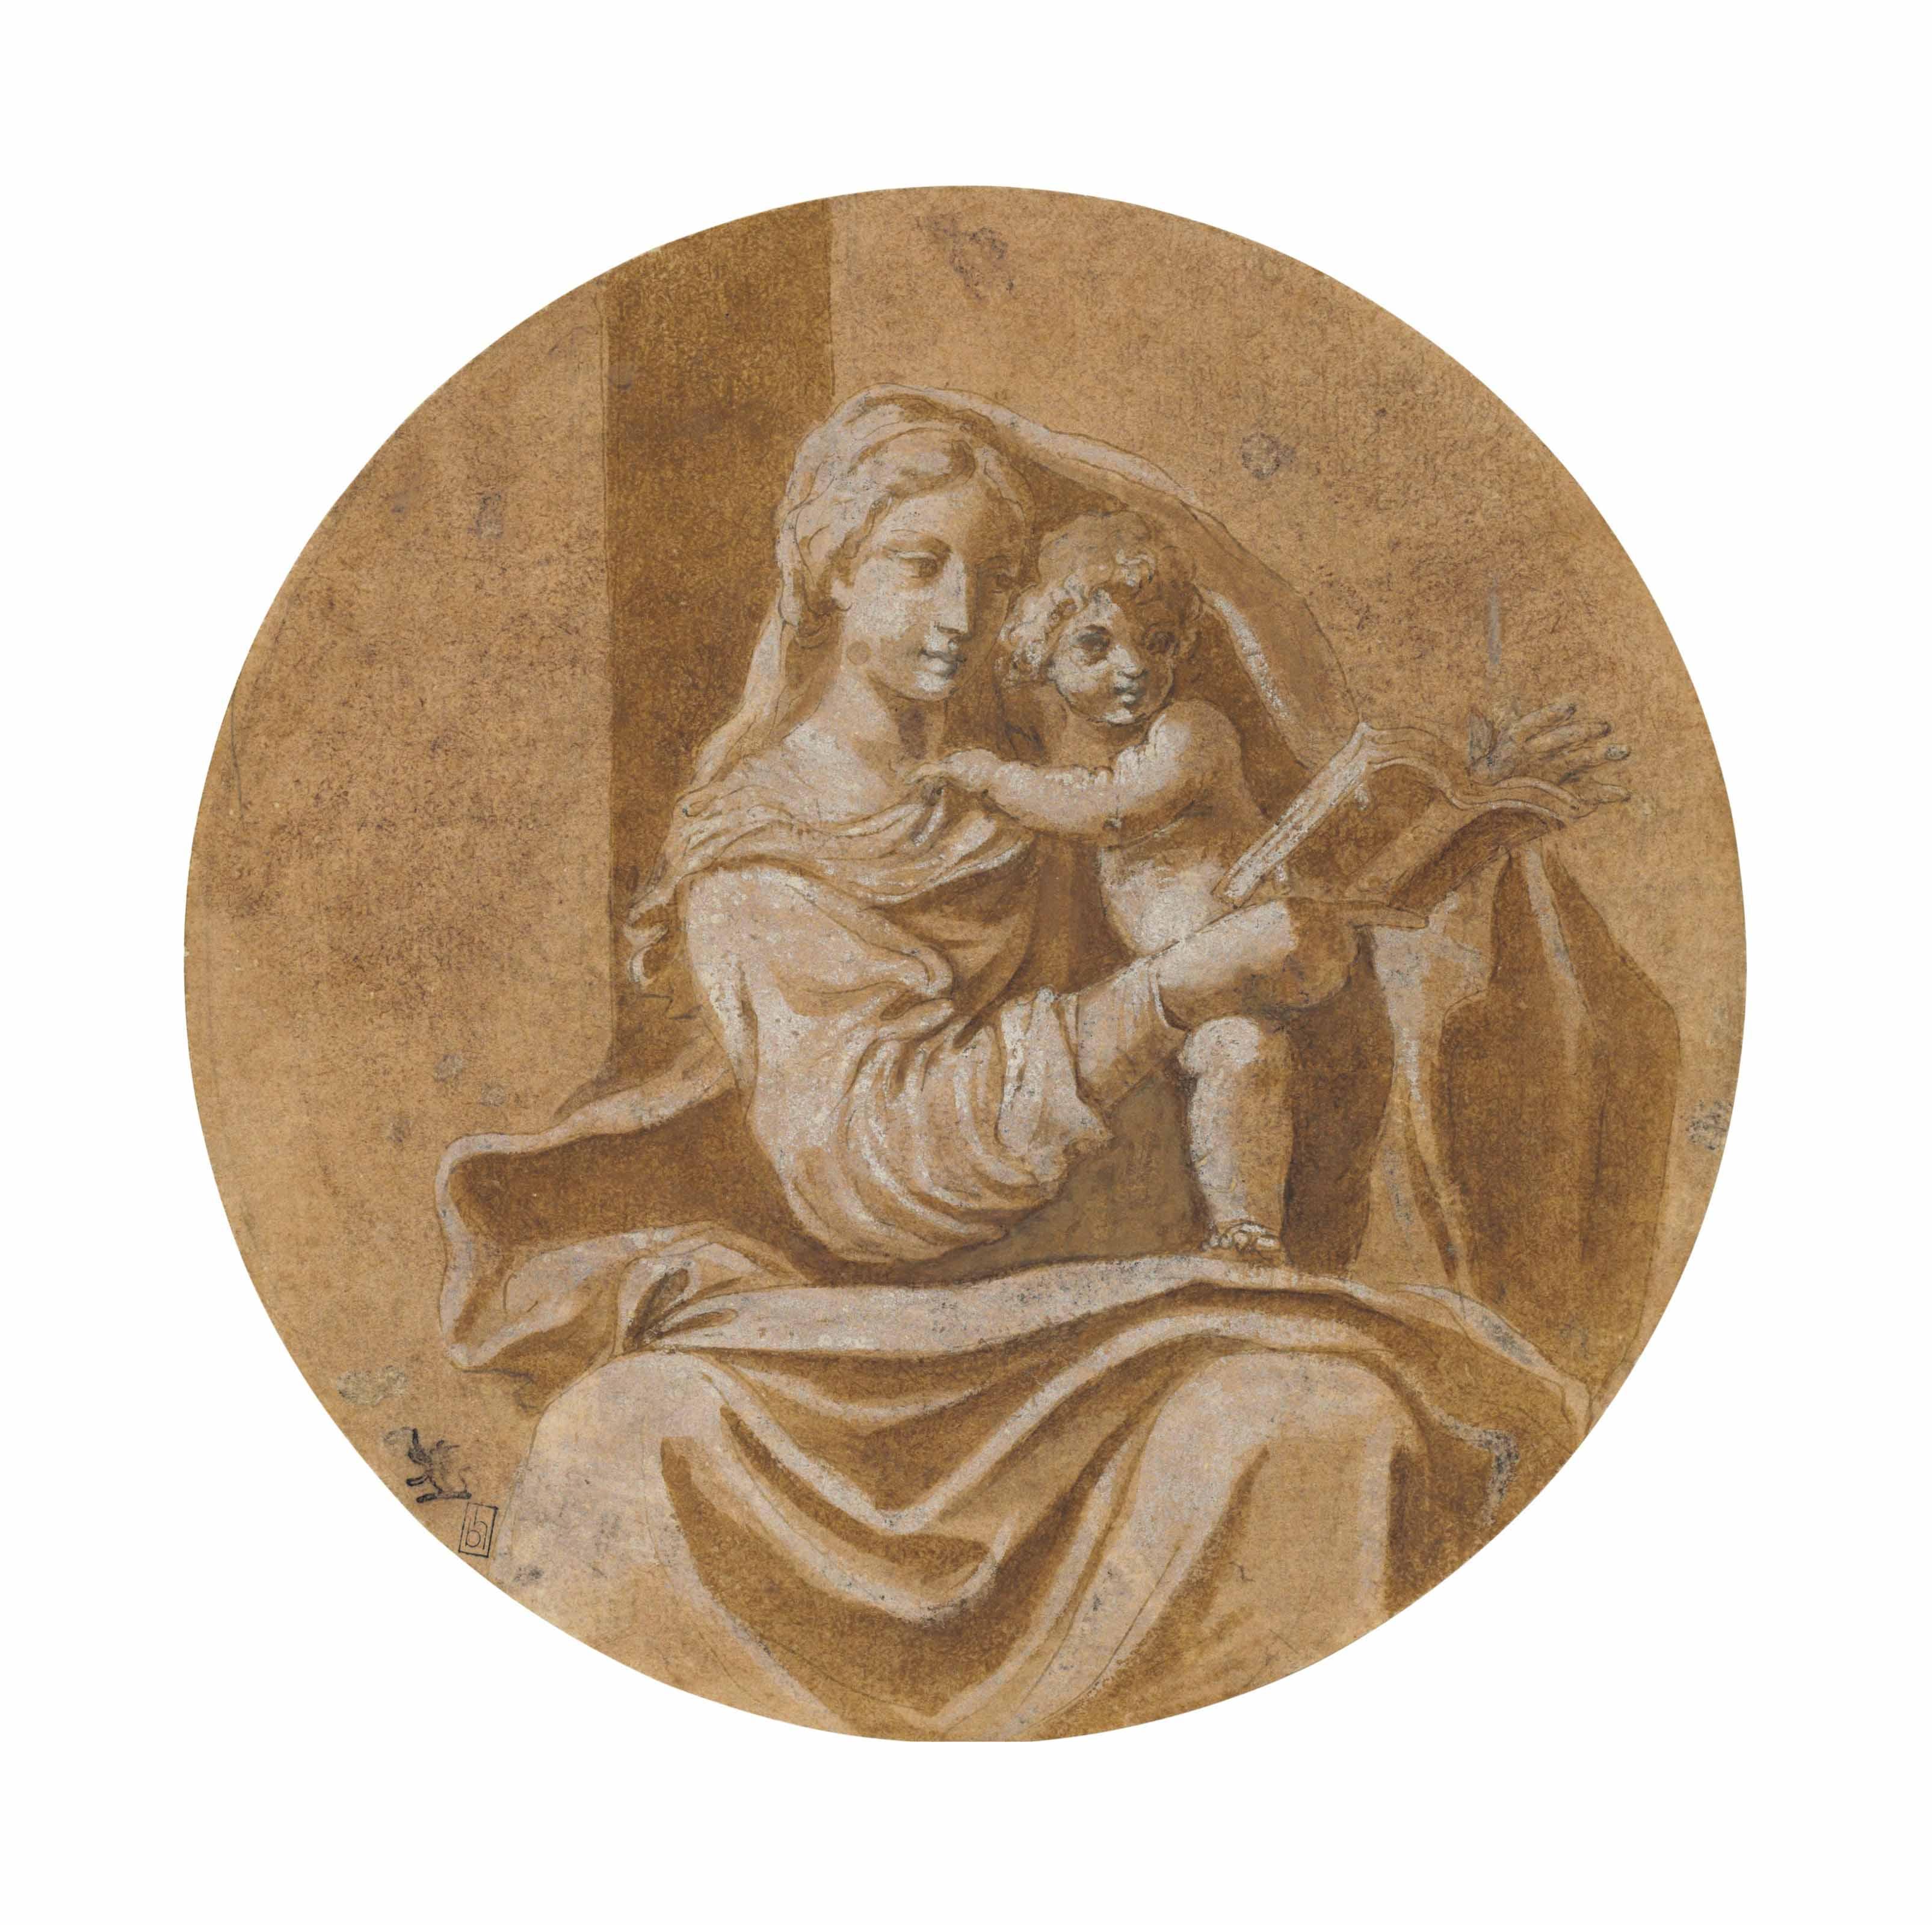 Circle of Annibale Carracci (Bologna 1560-1609)